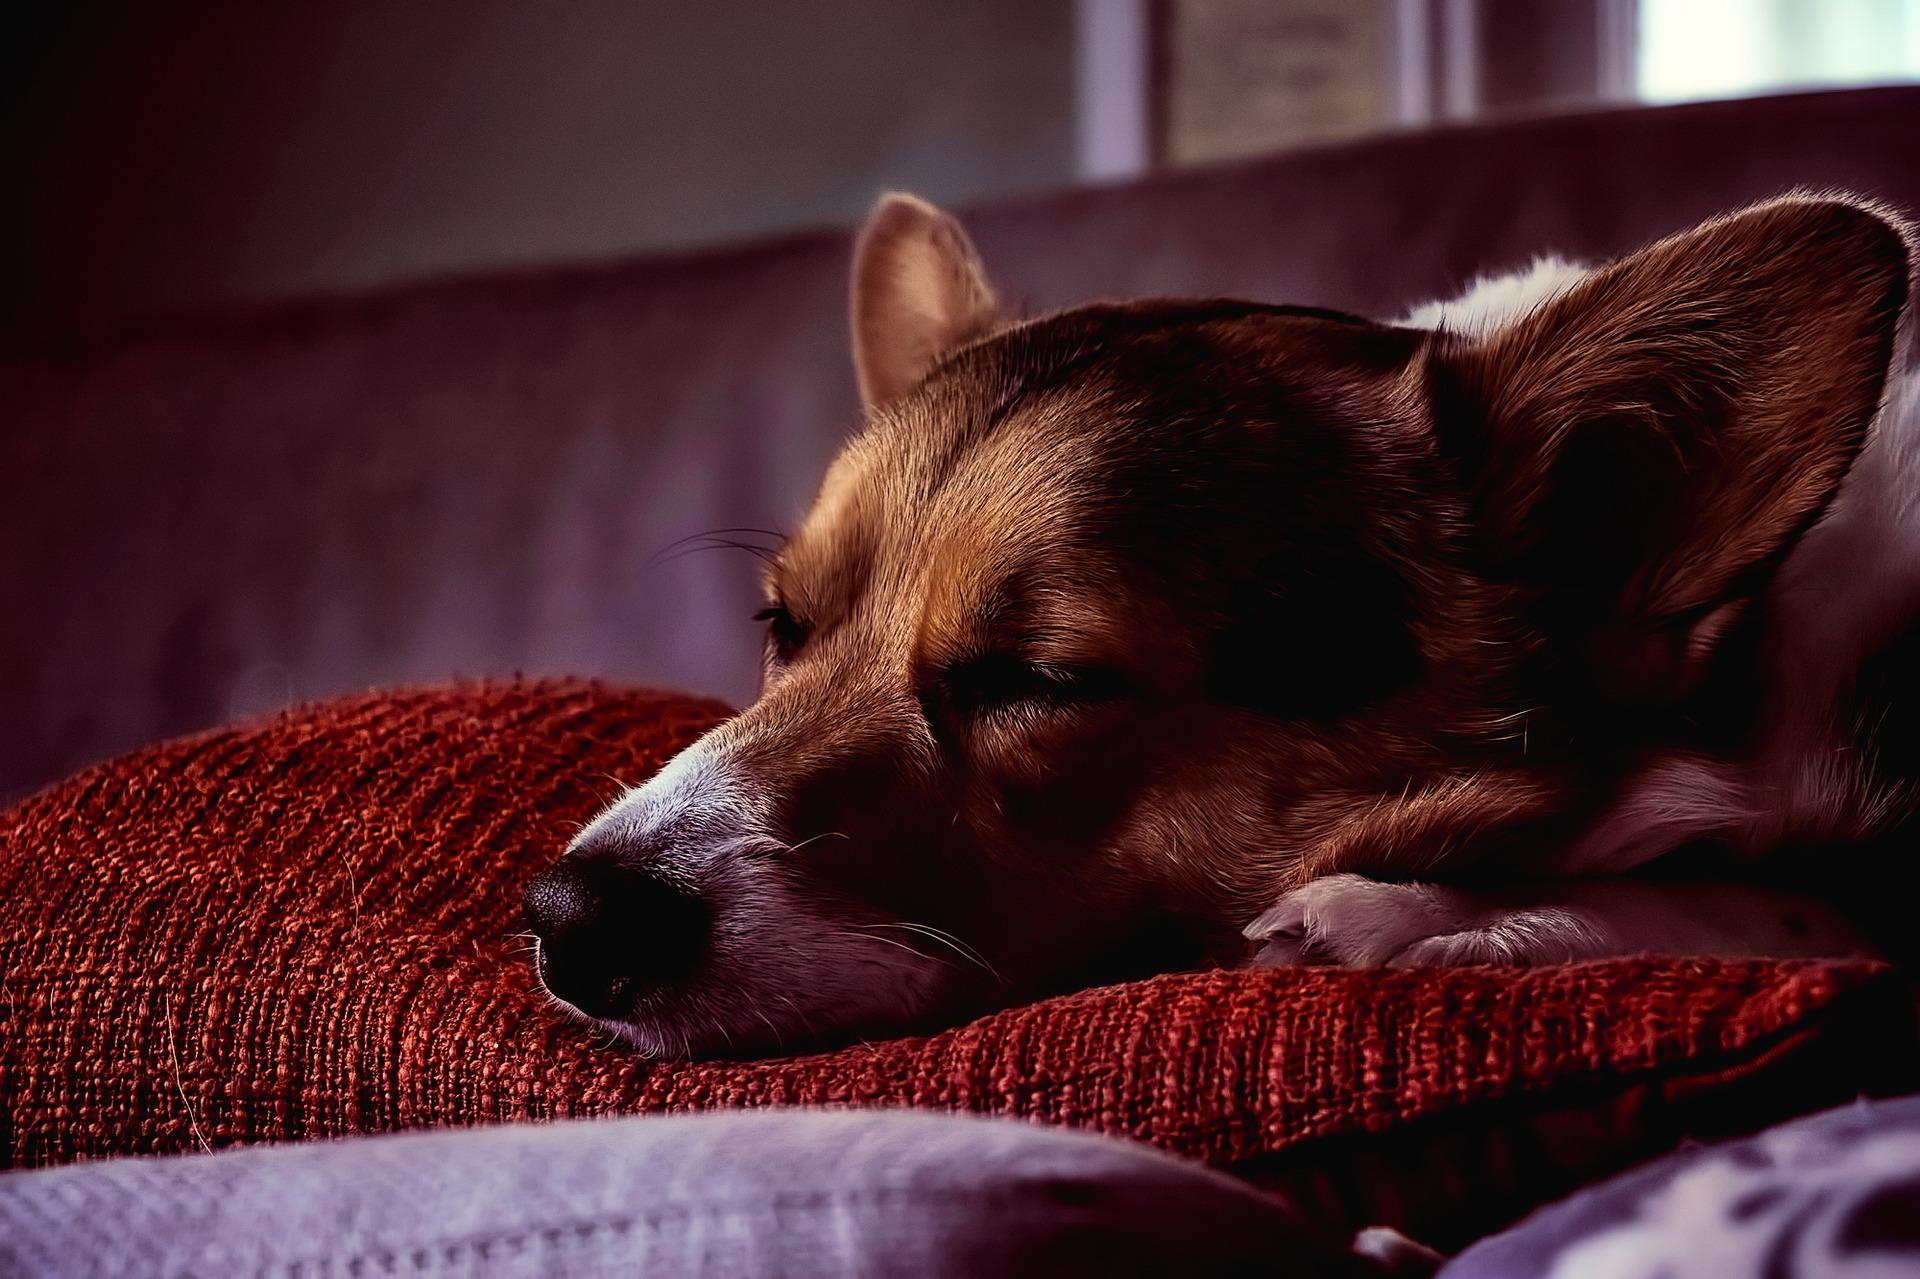 understanding the euthanasia process